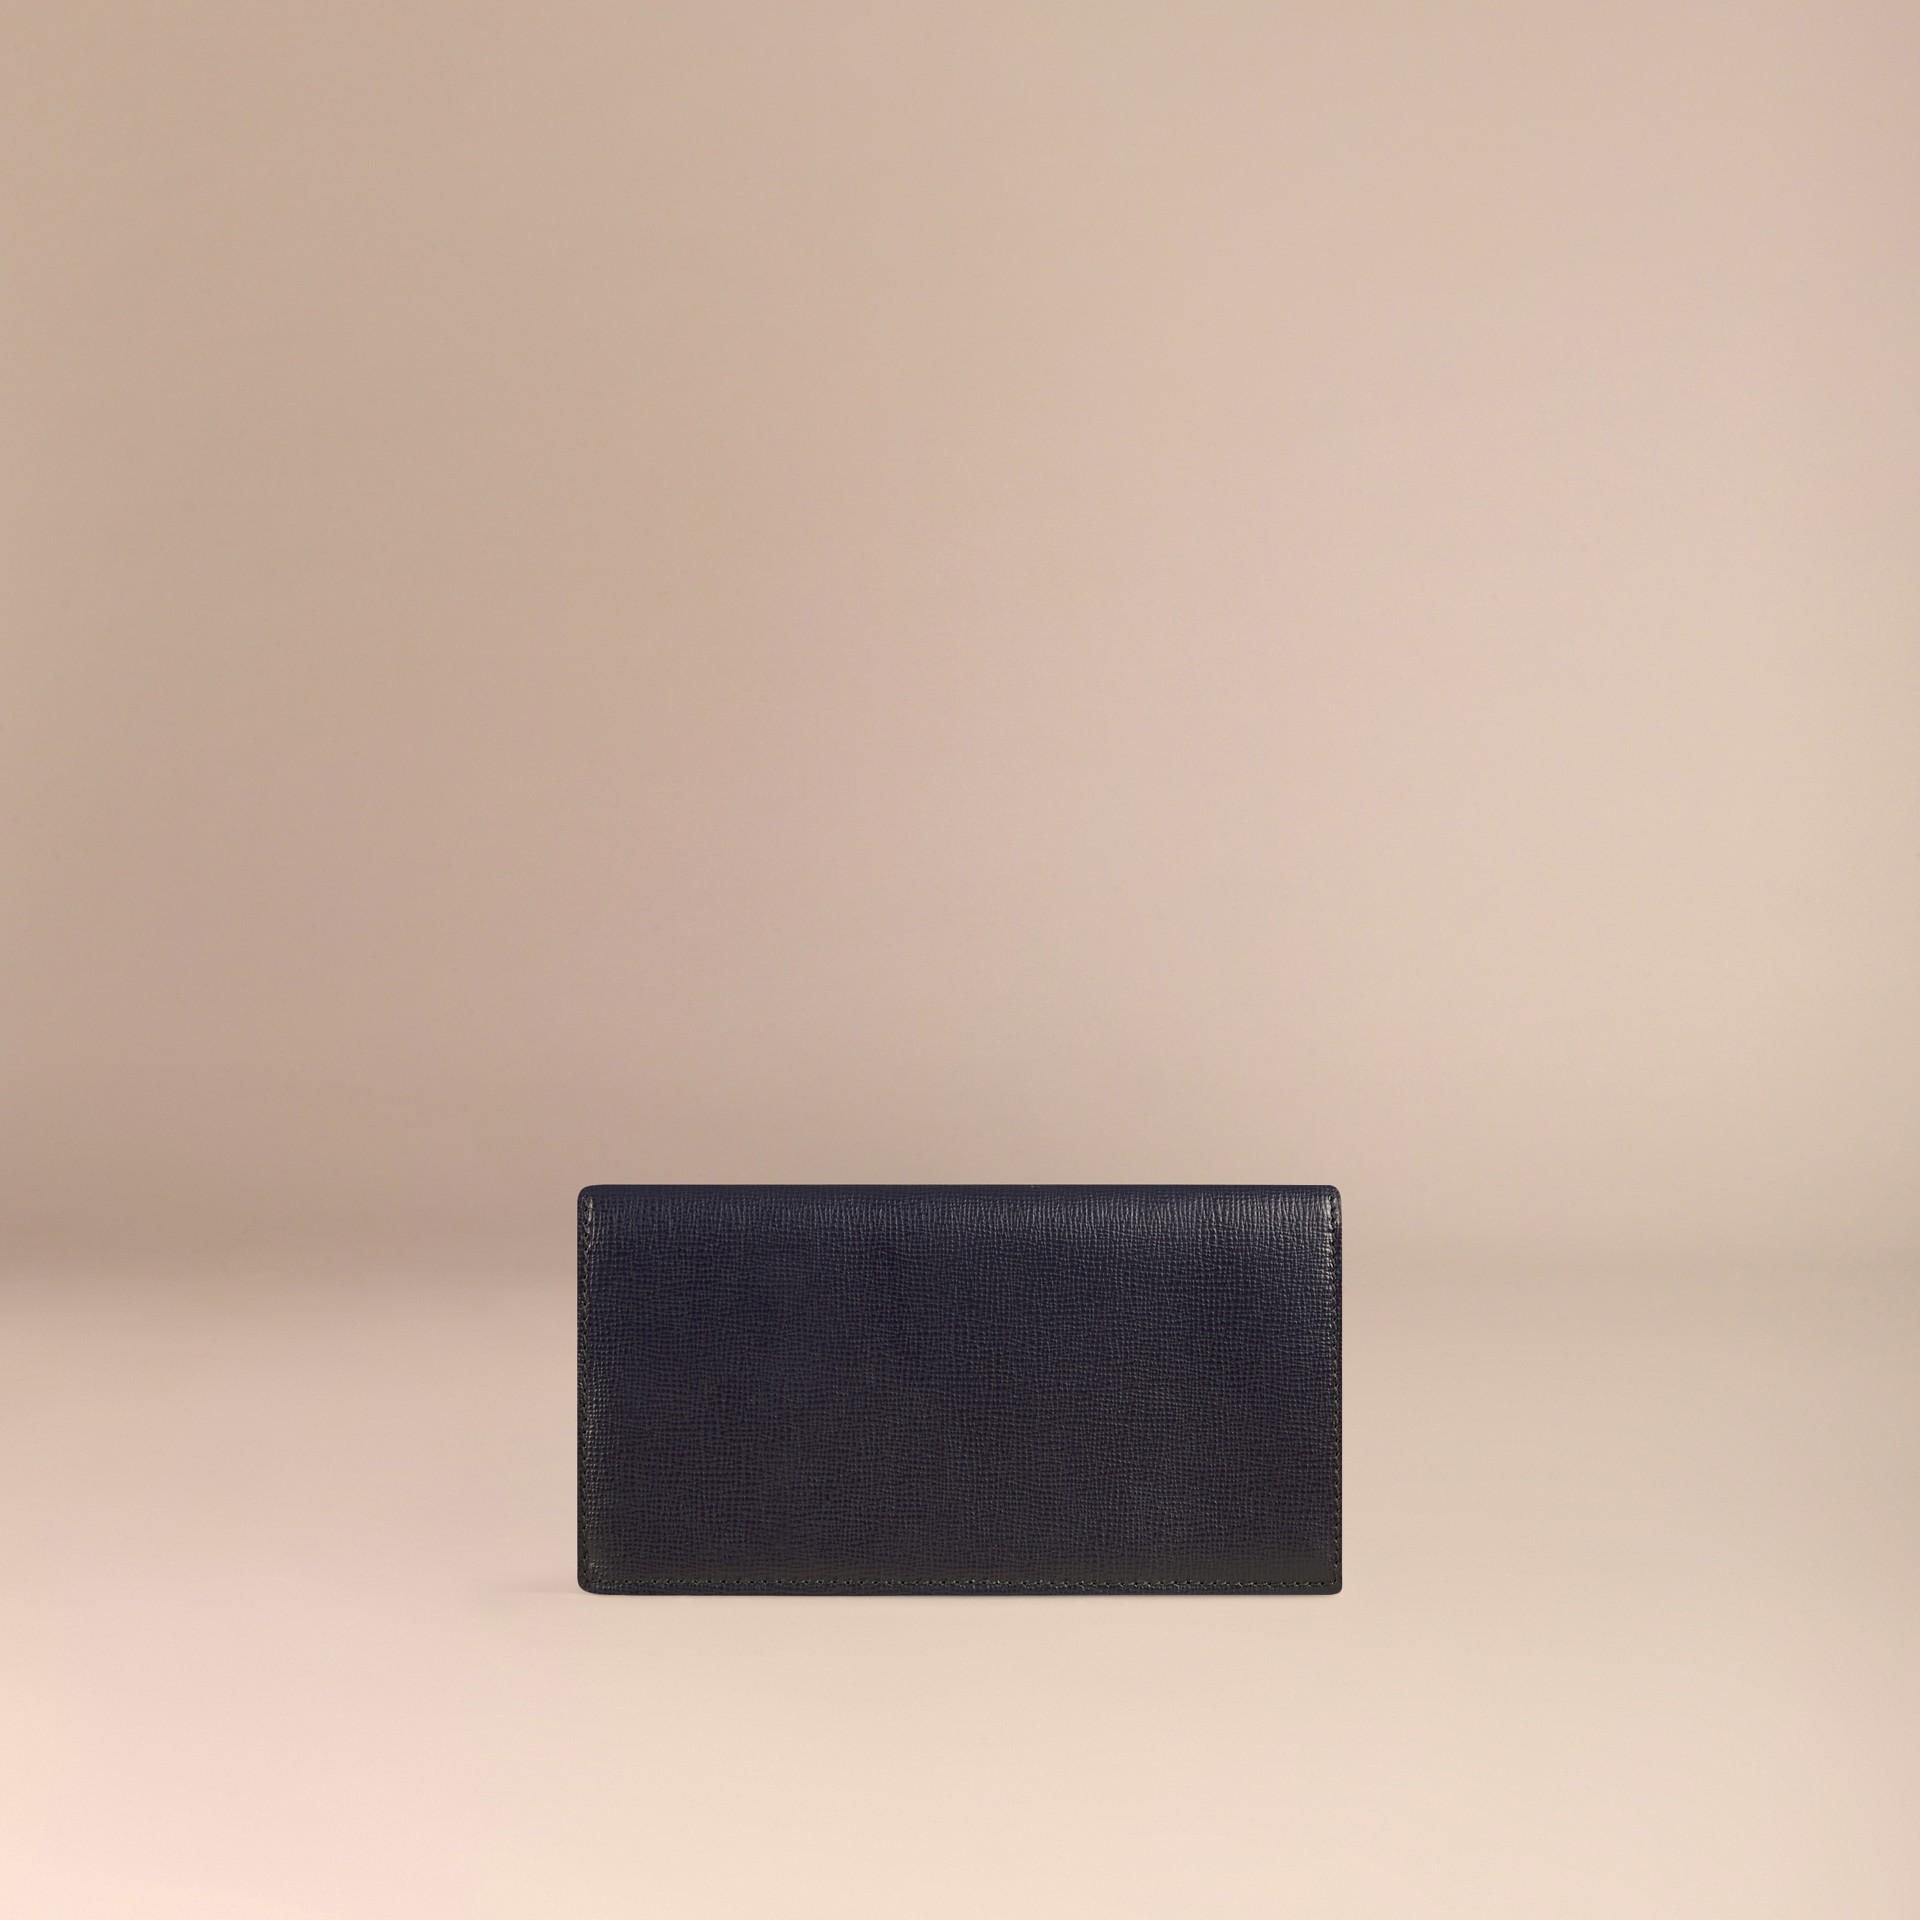 Dark navy London Leather Continental Wallet Dark Navy - gallery image 4